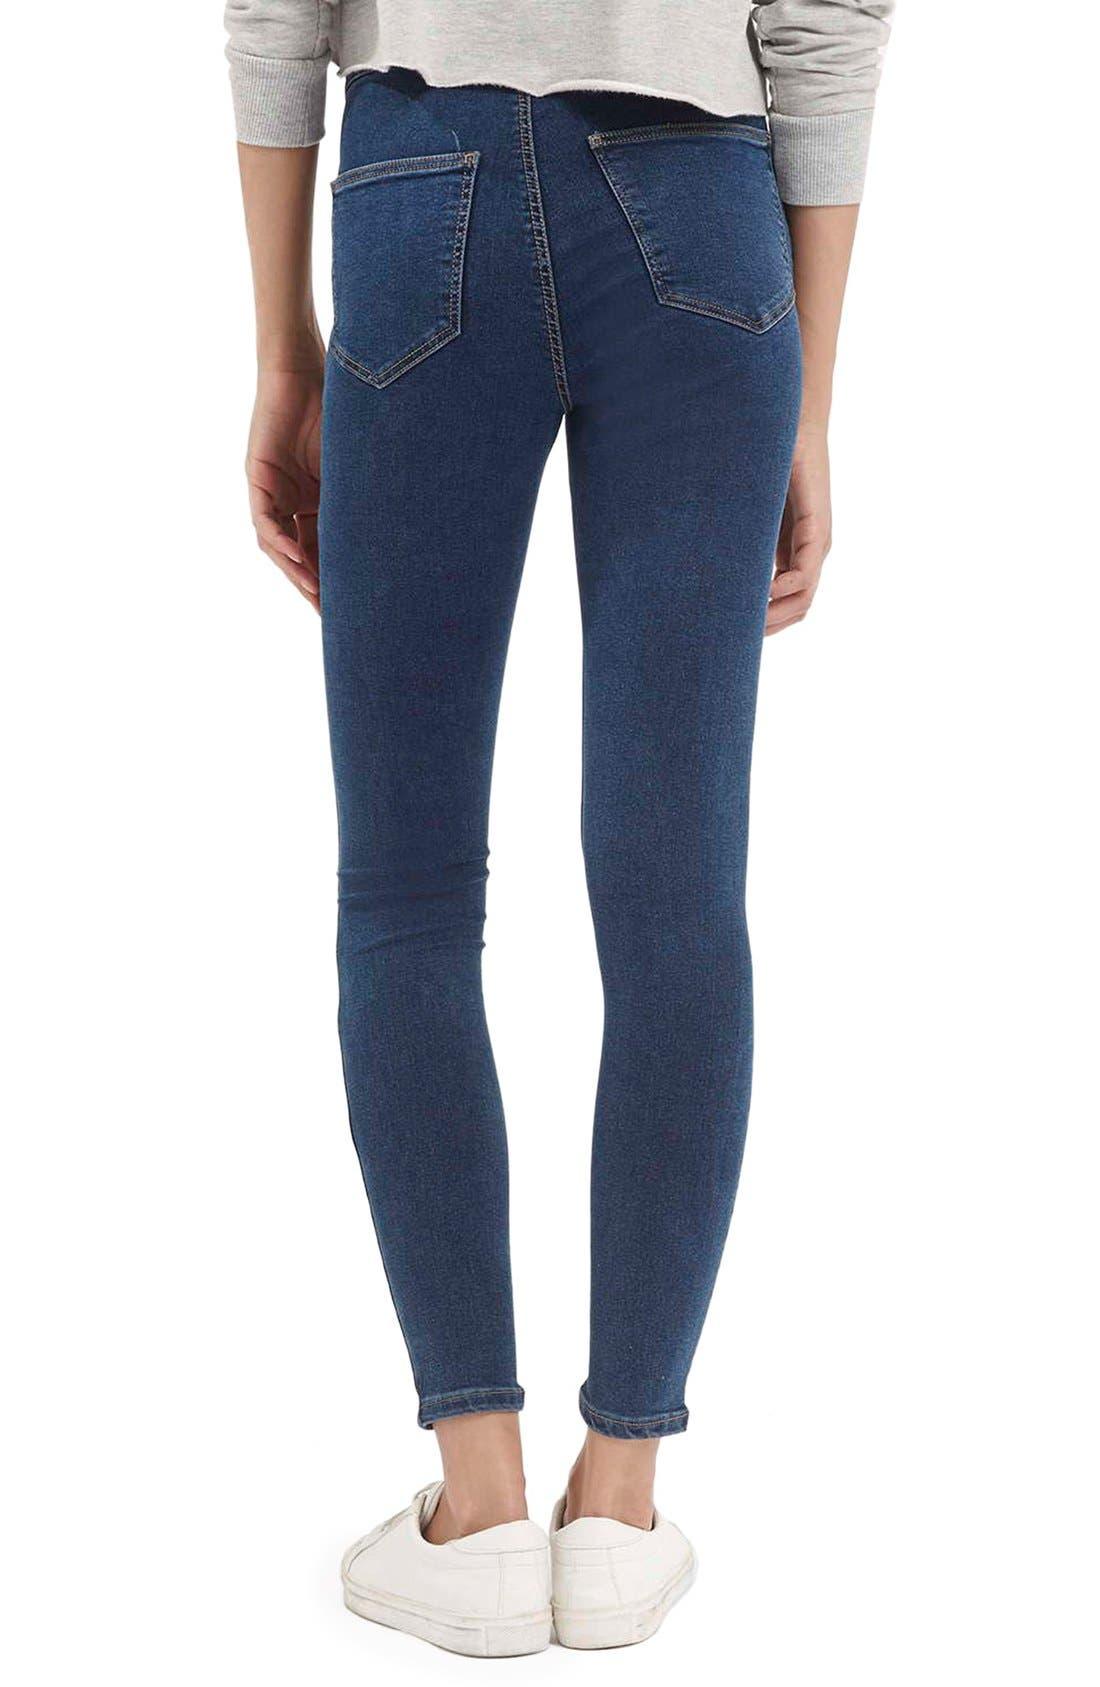 Alternate Image 3  - Topshop Moto'Joni' Ripped High Rise Skinny Jeans (Regular & Short)